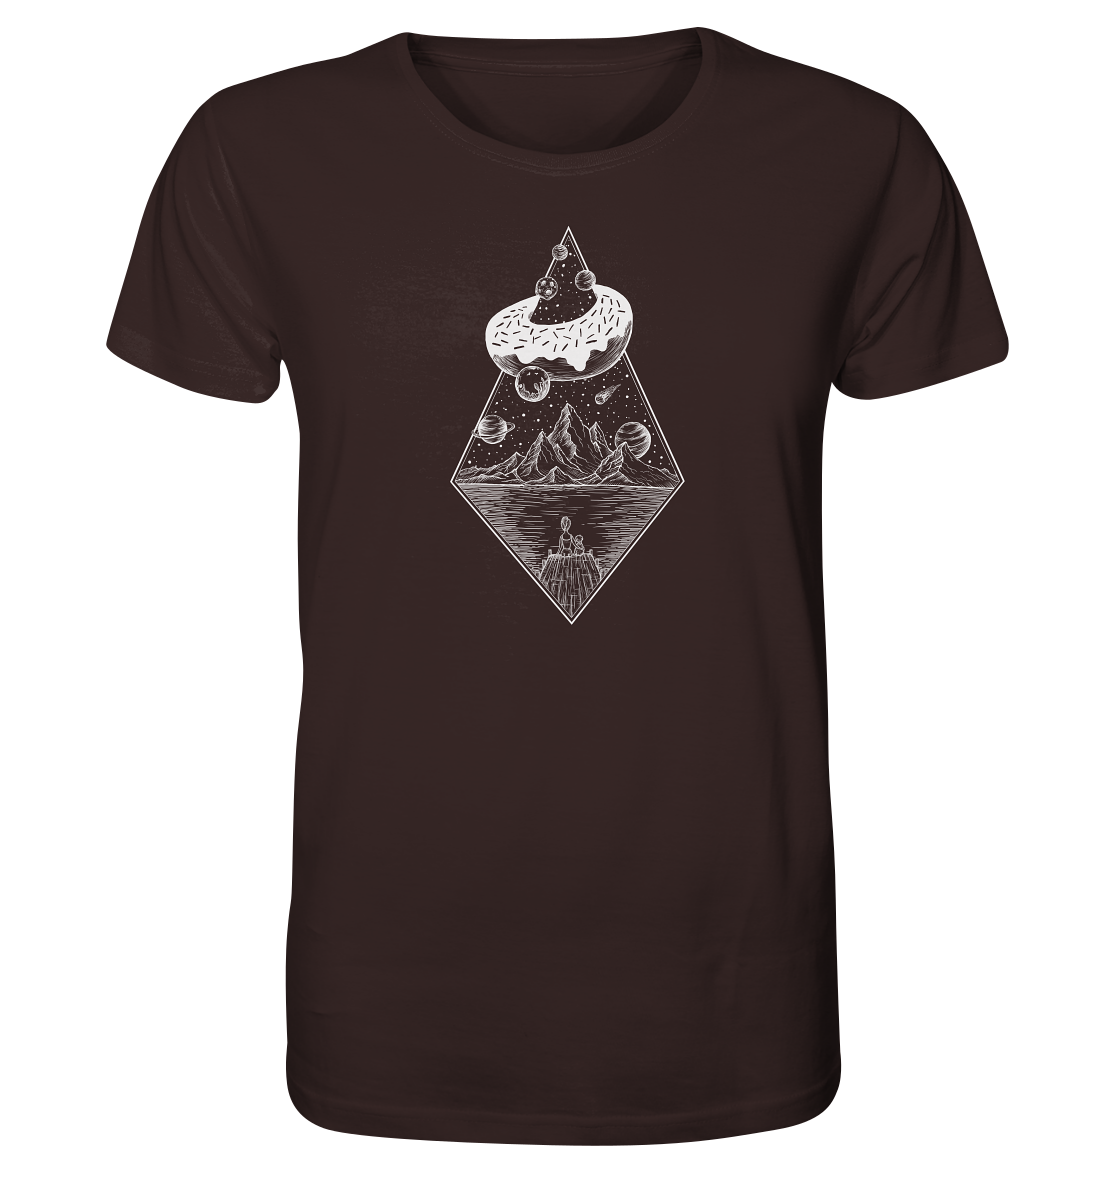 front-organic-shirt-372726-1116x-1.png